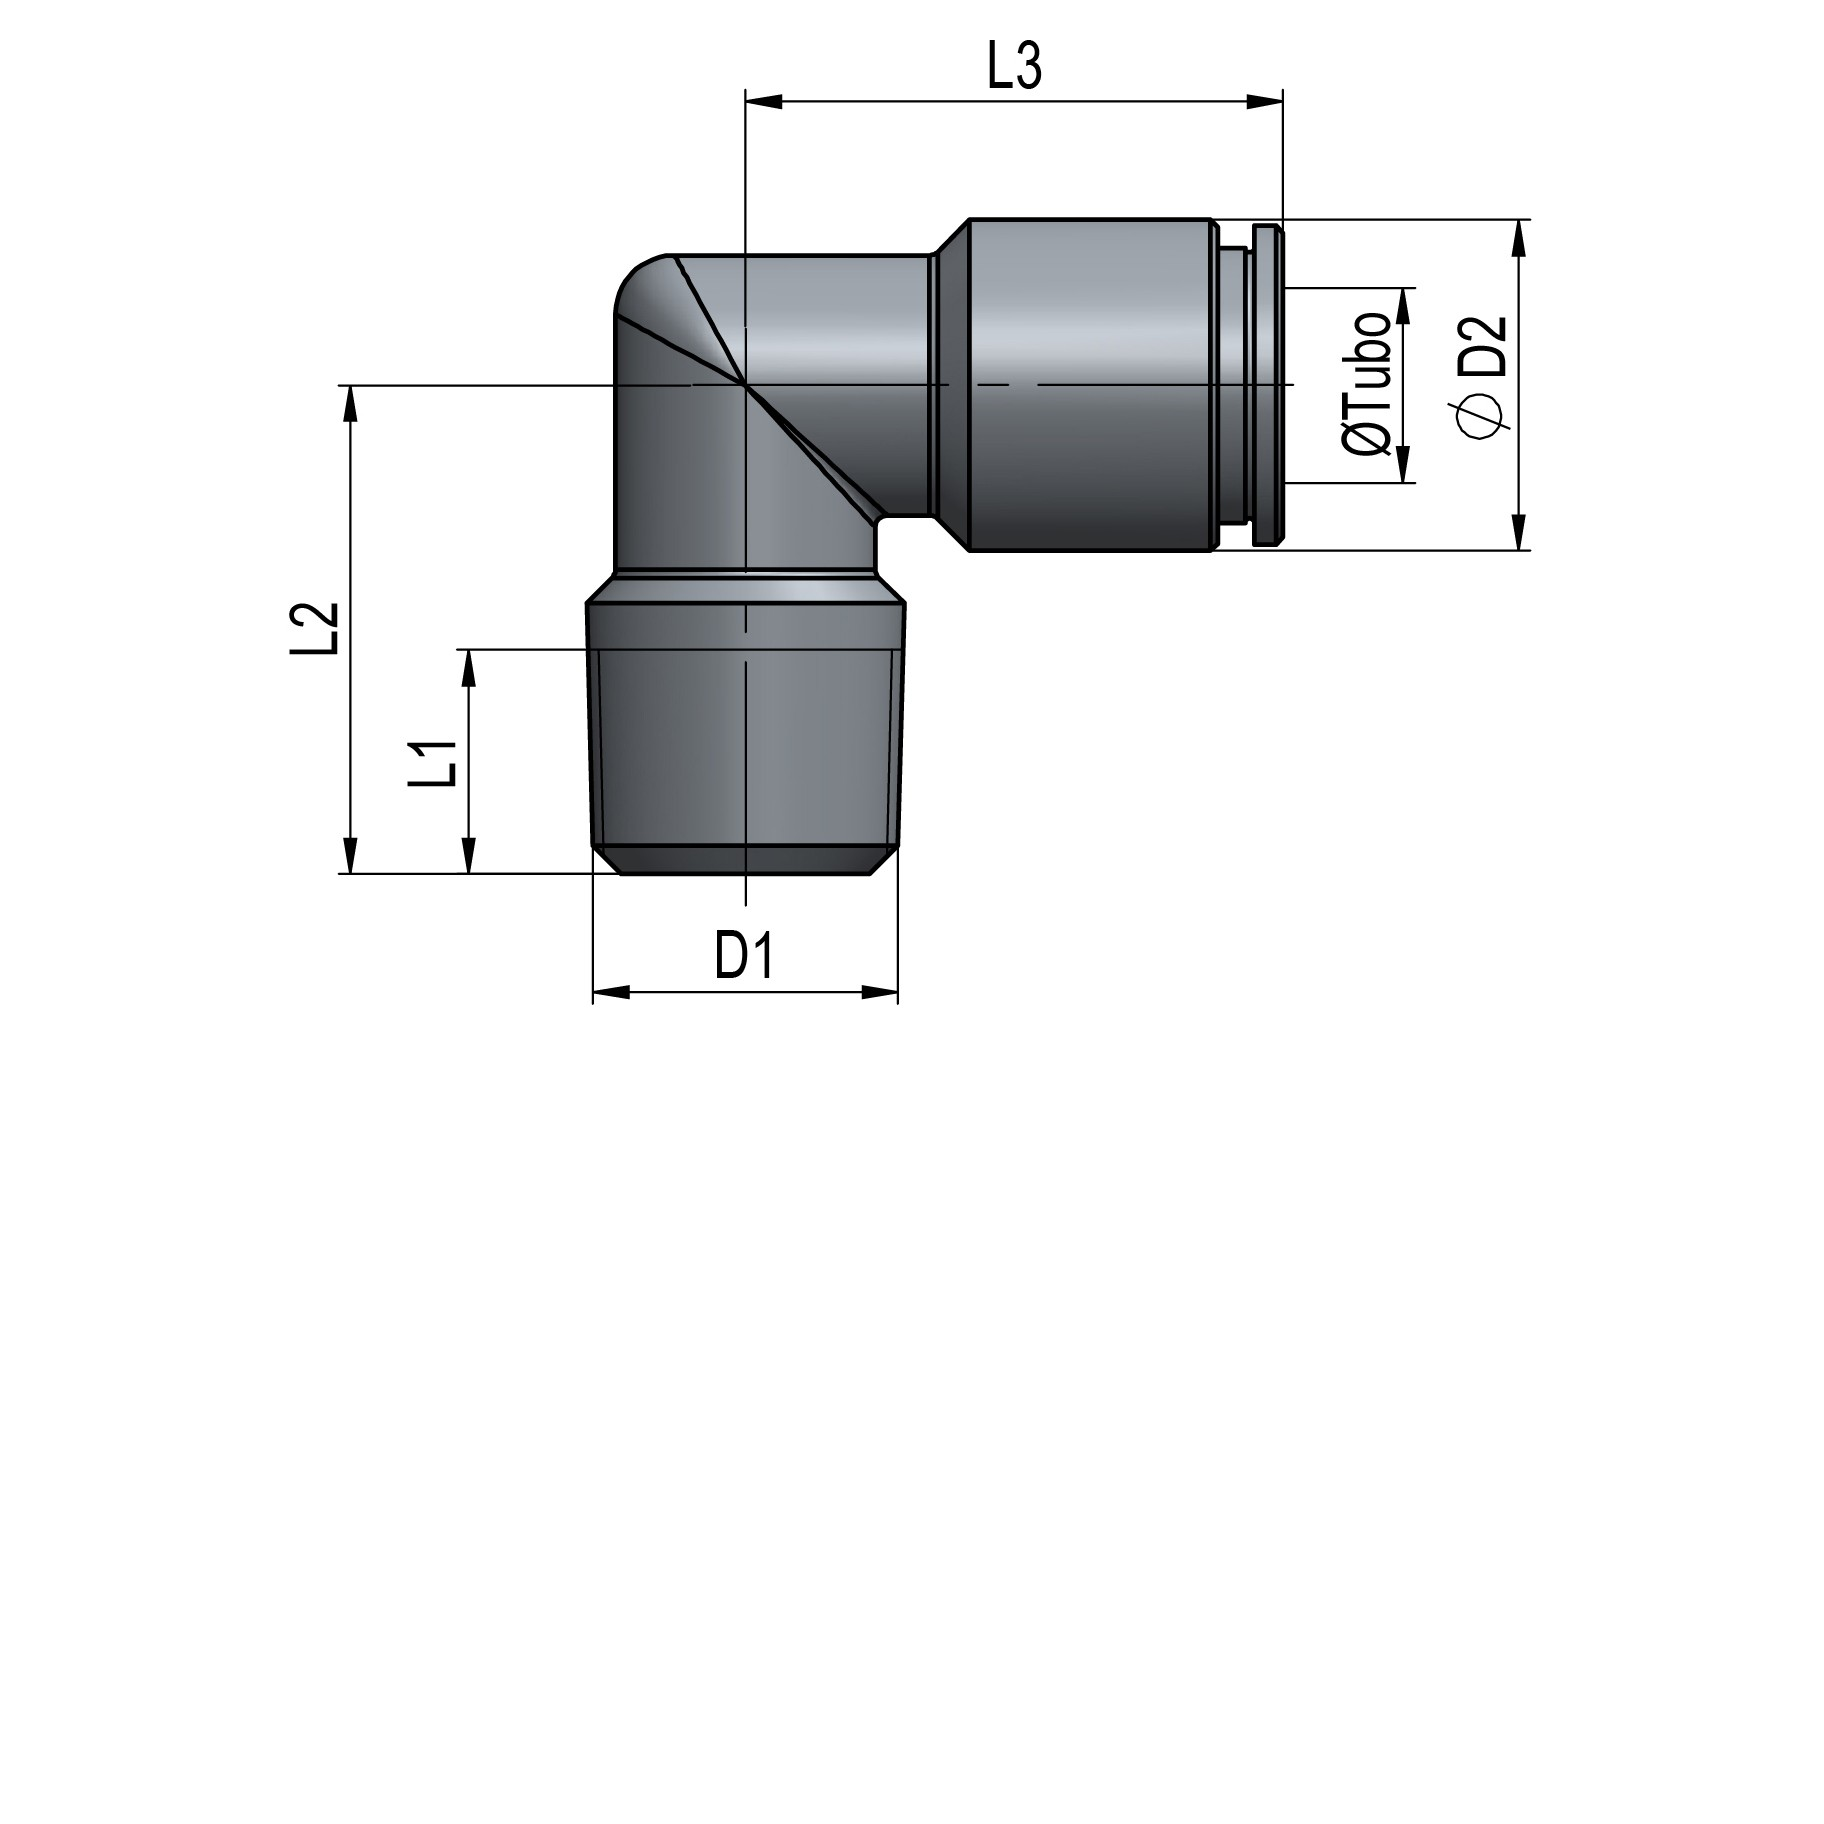 MX14 06 14